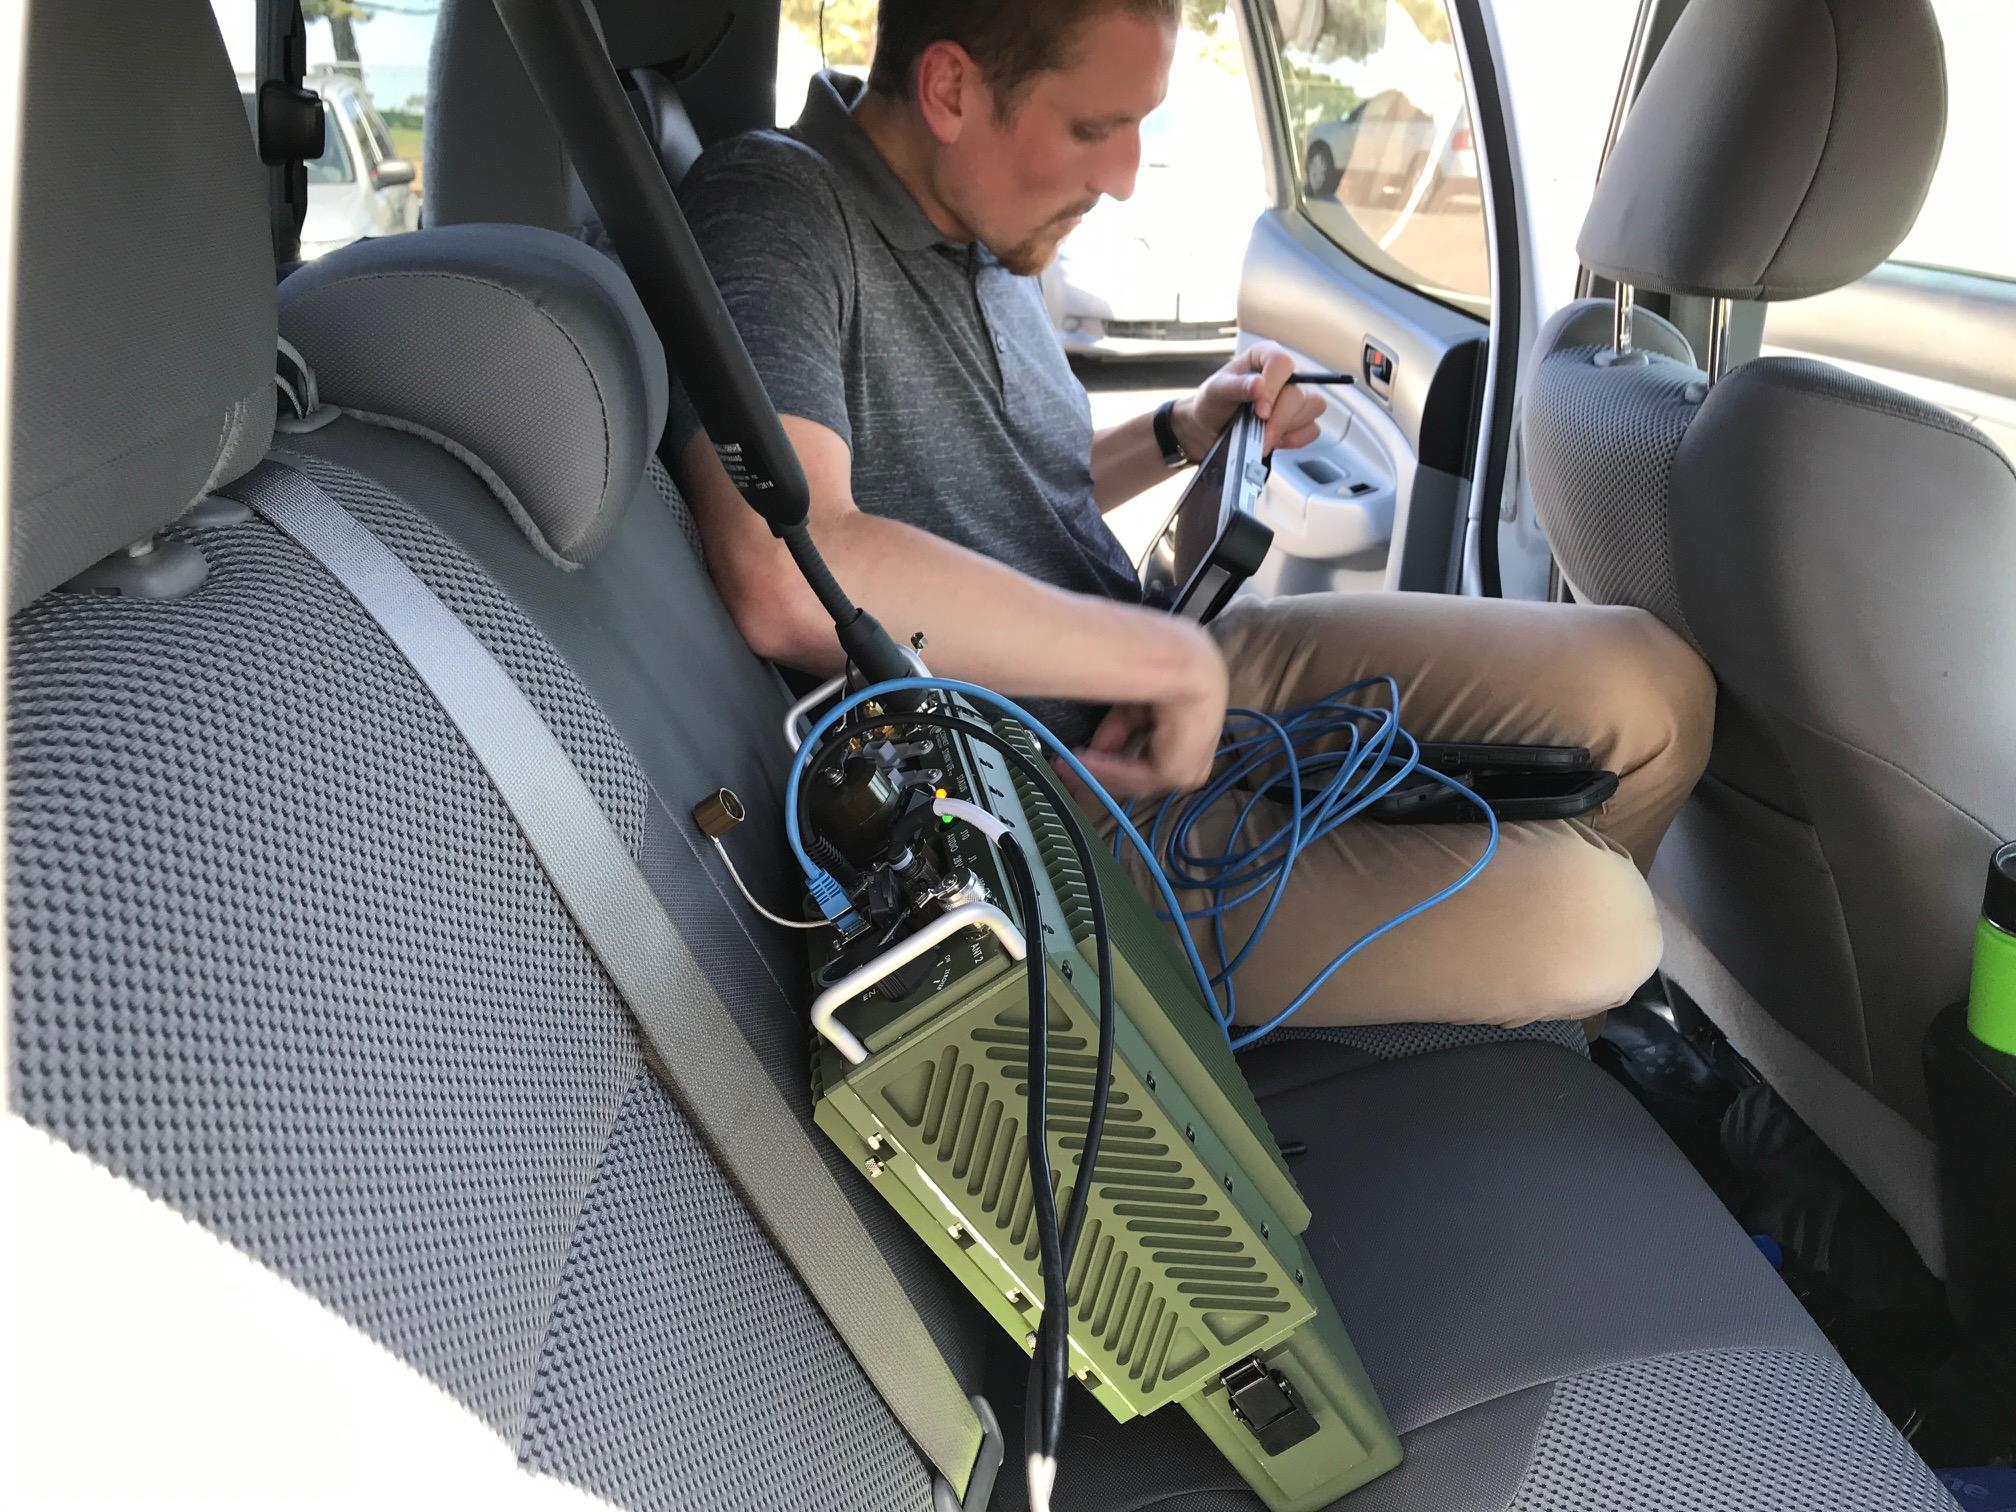 STINN LTE Manpack training in action